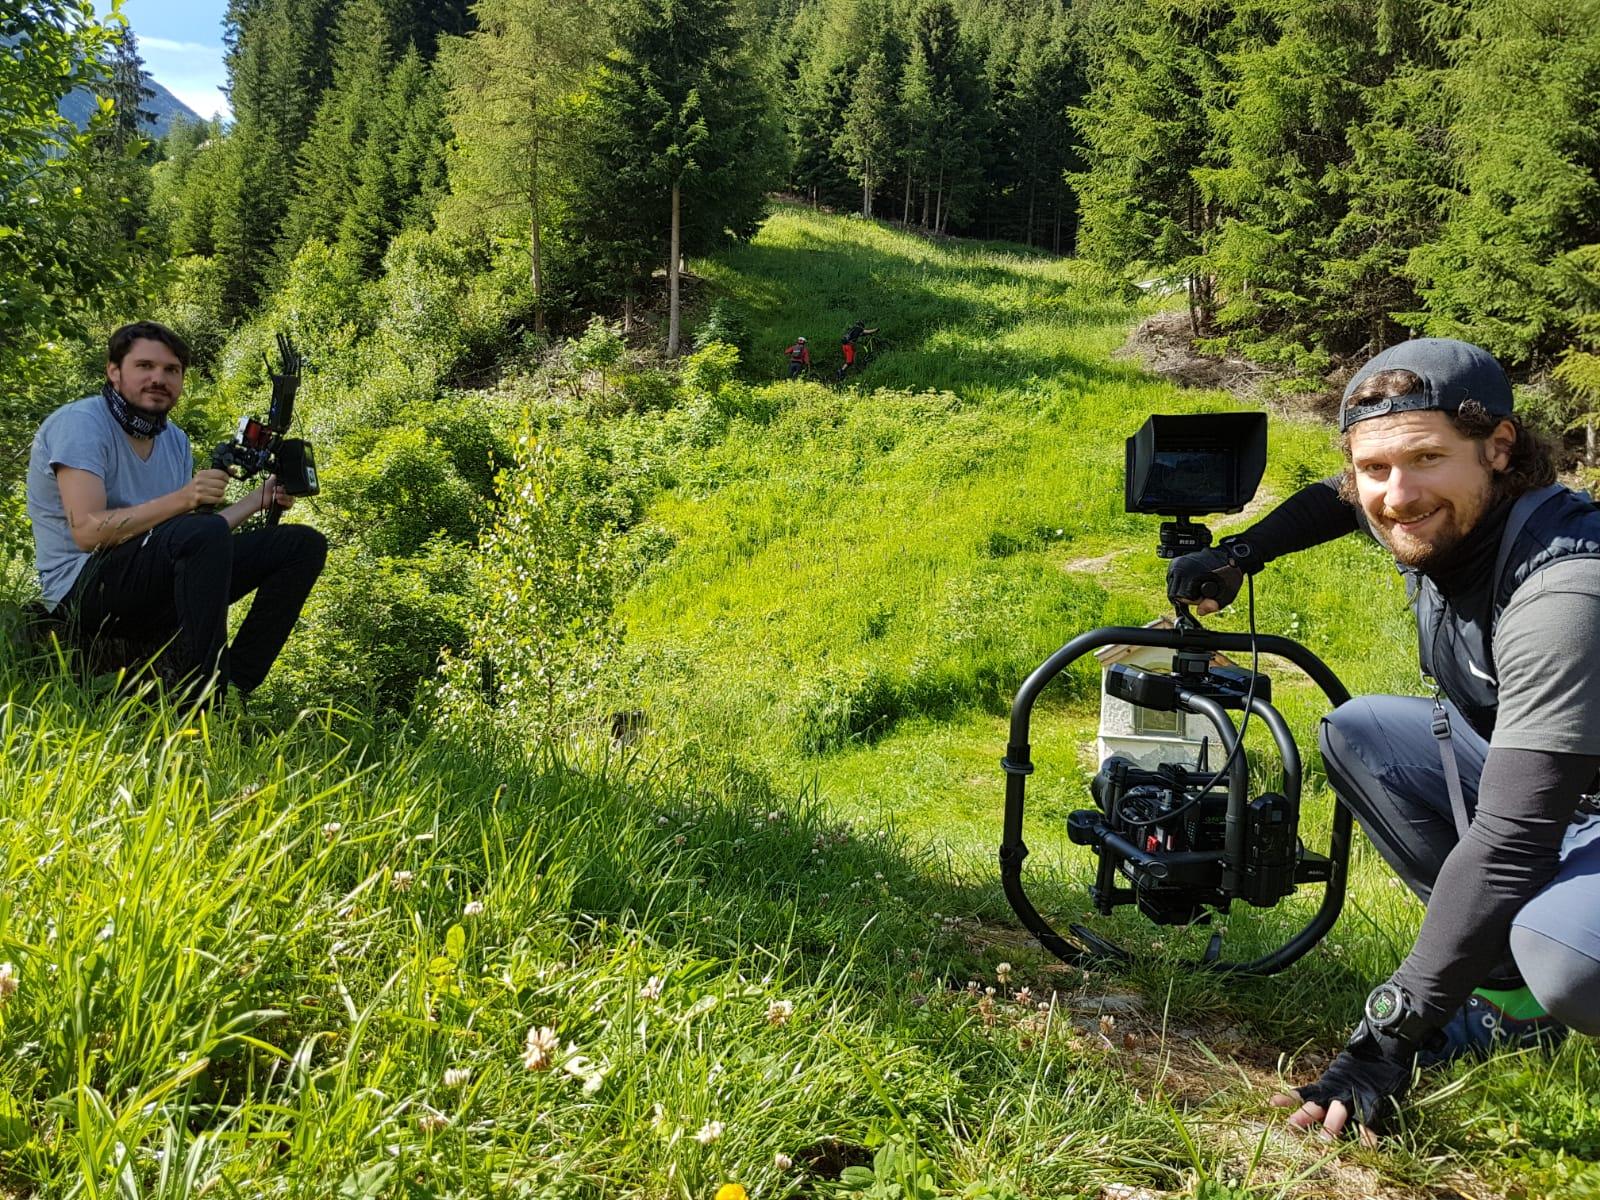 Kamera Crew Österreich / Sony FS7 / RED Scarlet-W / Mövi Pro Salzburg Linz